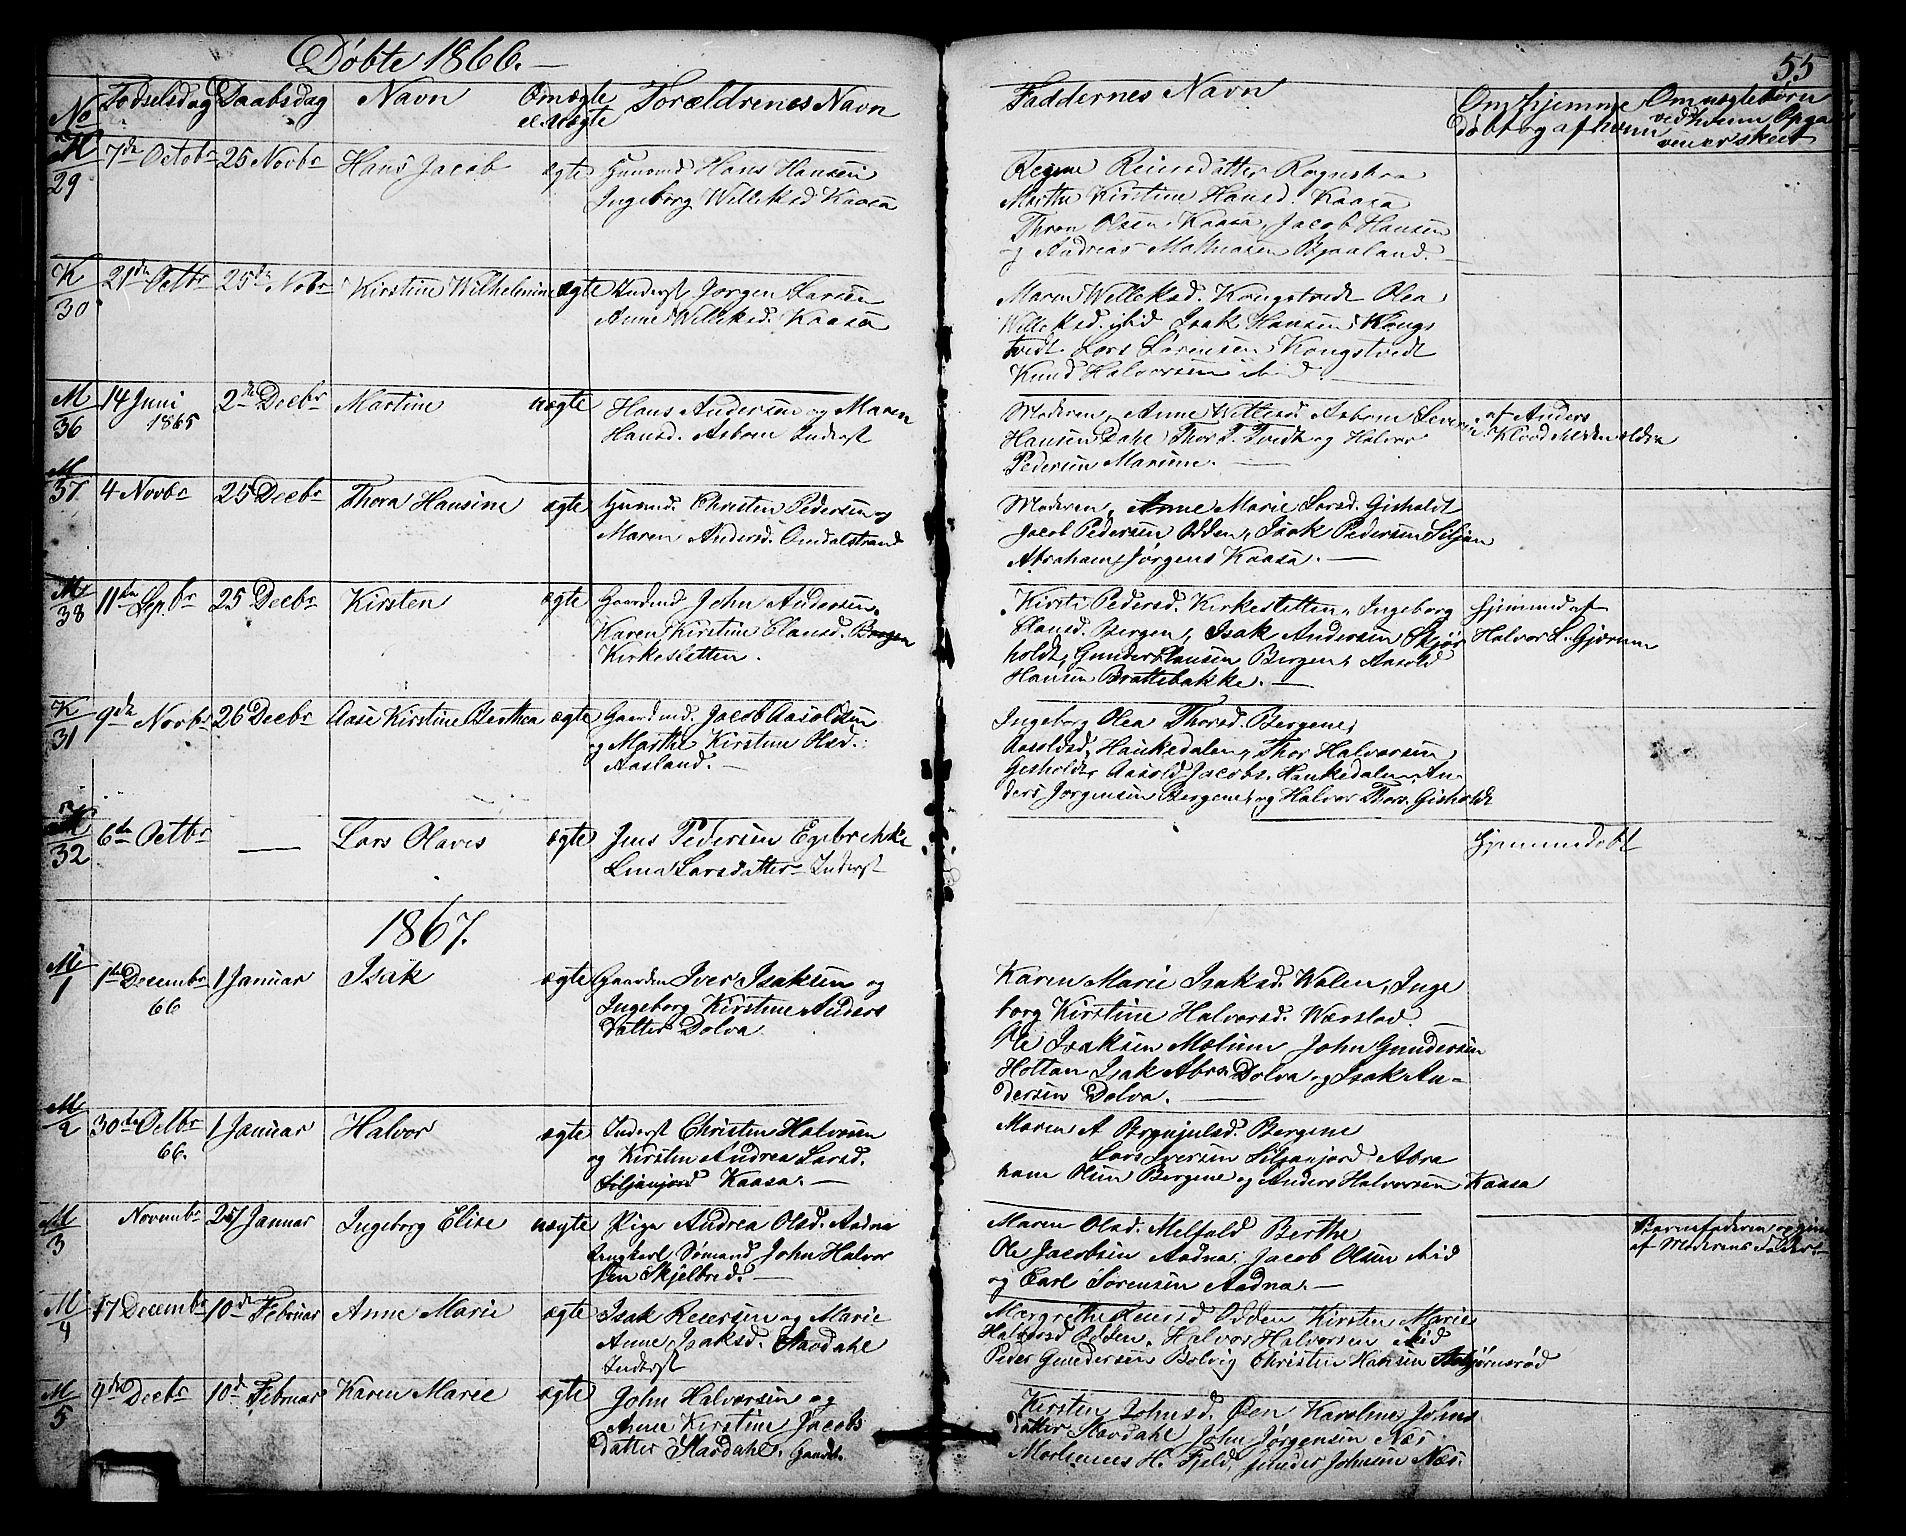 SAKO, Solum kirkebøker, G/Gb/L0002: Klokkerbok nr. II 2, 1859-1879, s. 55